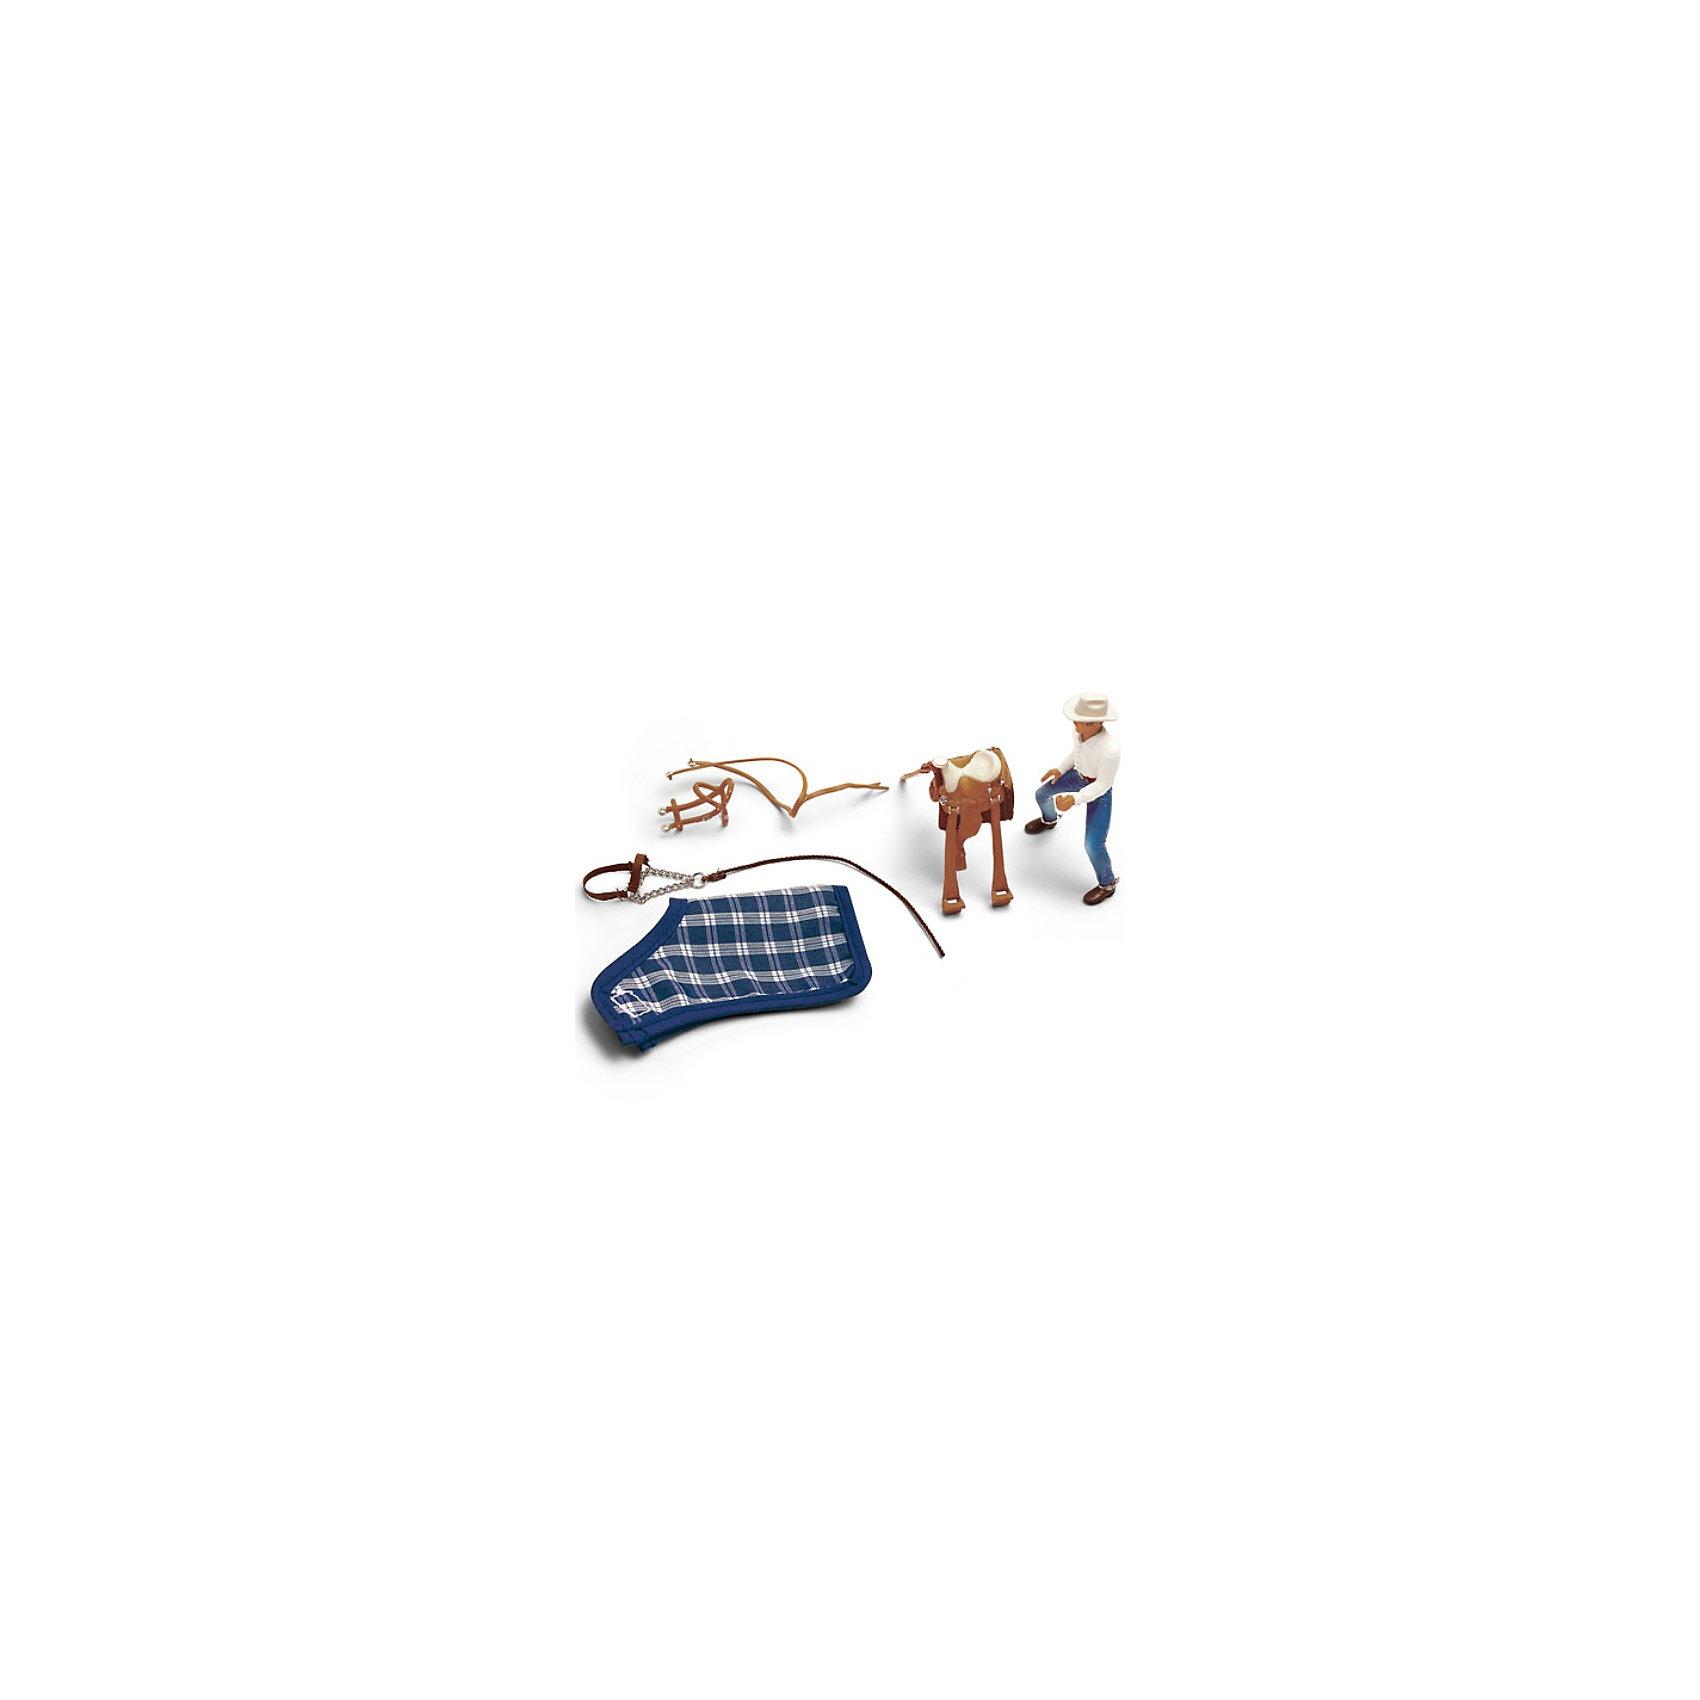 Schleich Schleich Ковбойский набор для верховой езды. Серия Ферма schleich игровой набор для турнира